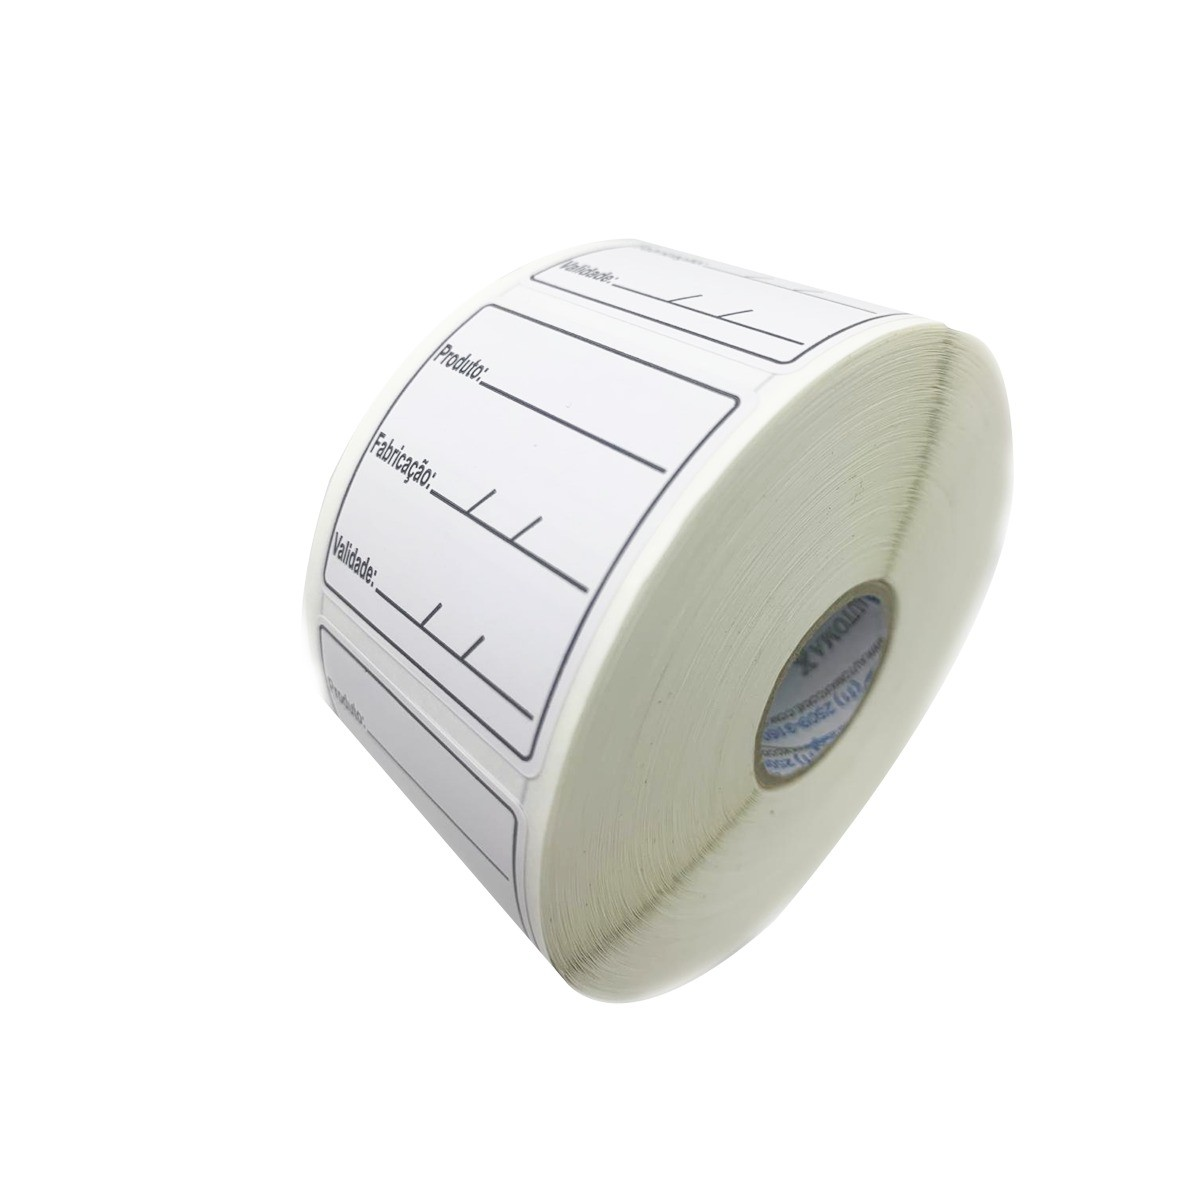 48 Rolos Etiqueta Adesiva Couche 40x40 | Anvisa para Alimentos Manipulados